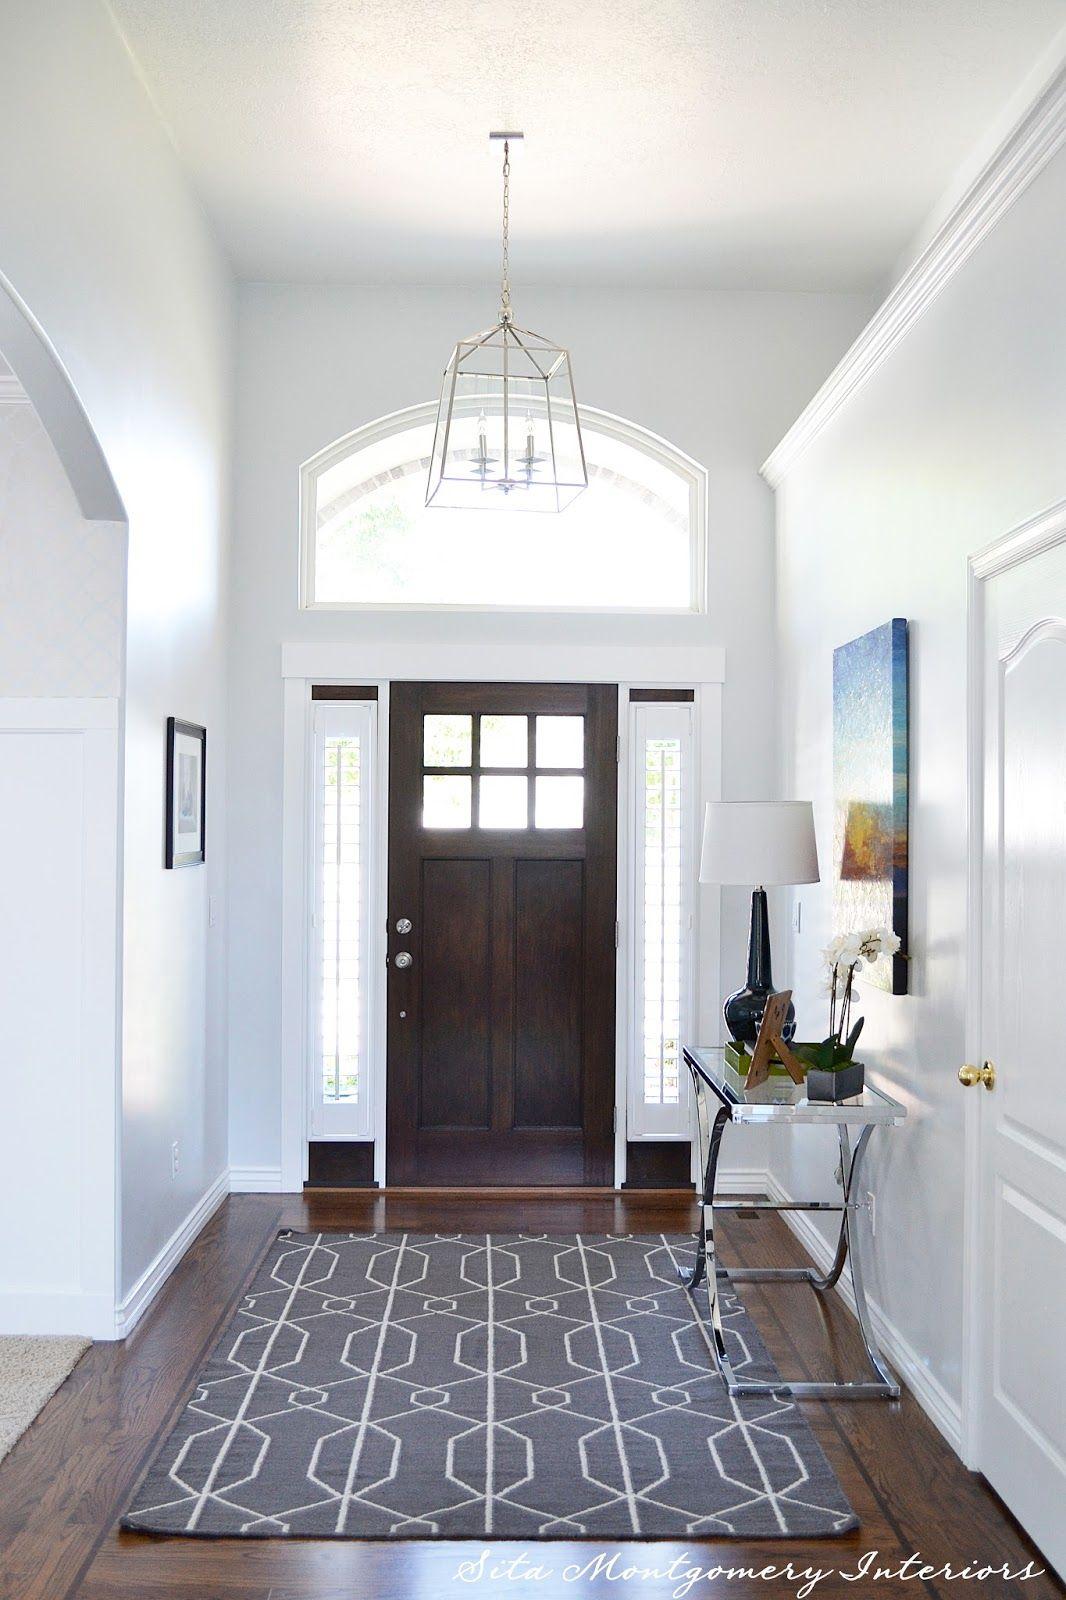 //www.sitamontgomeryinteriors.com/p/portfolio.html?m=1 ... on foyer lighting ideas, small entryway lighting ideas, modern foyer chandelier lighting, split foyer entry way wall ideas,